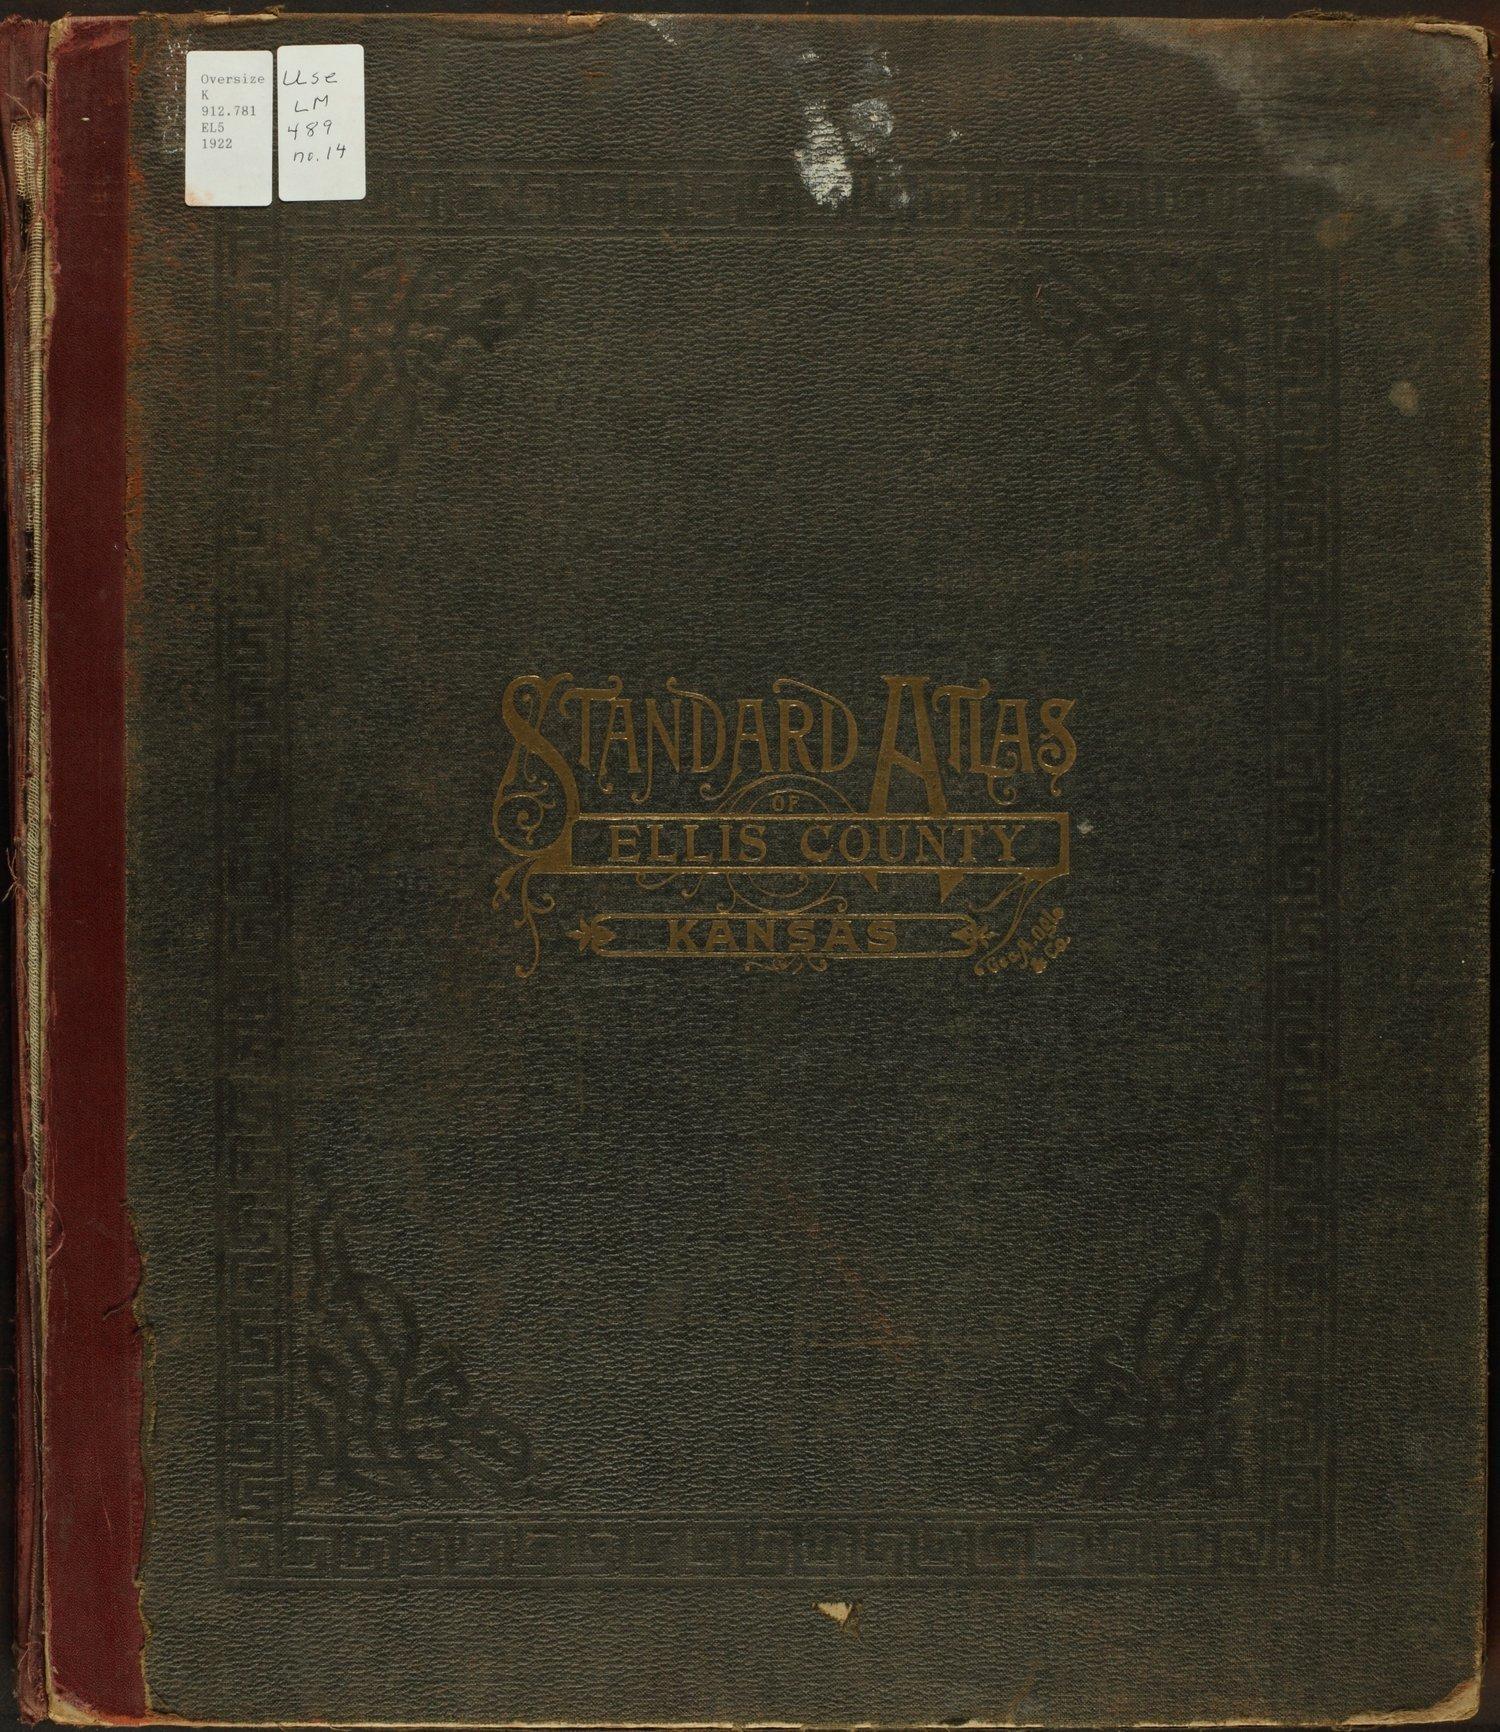 Standard atlas of Ellis County, Kansas - Front Cover